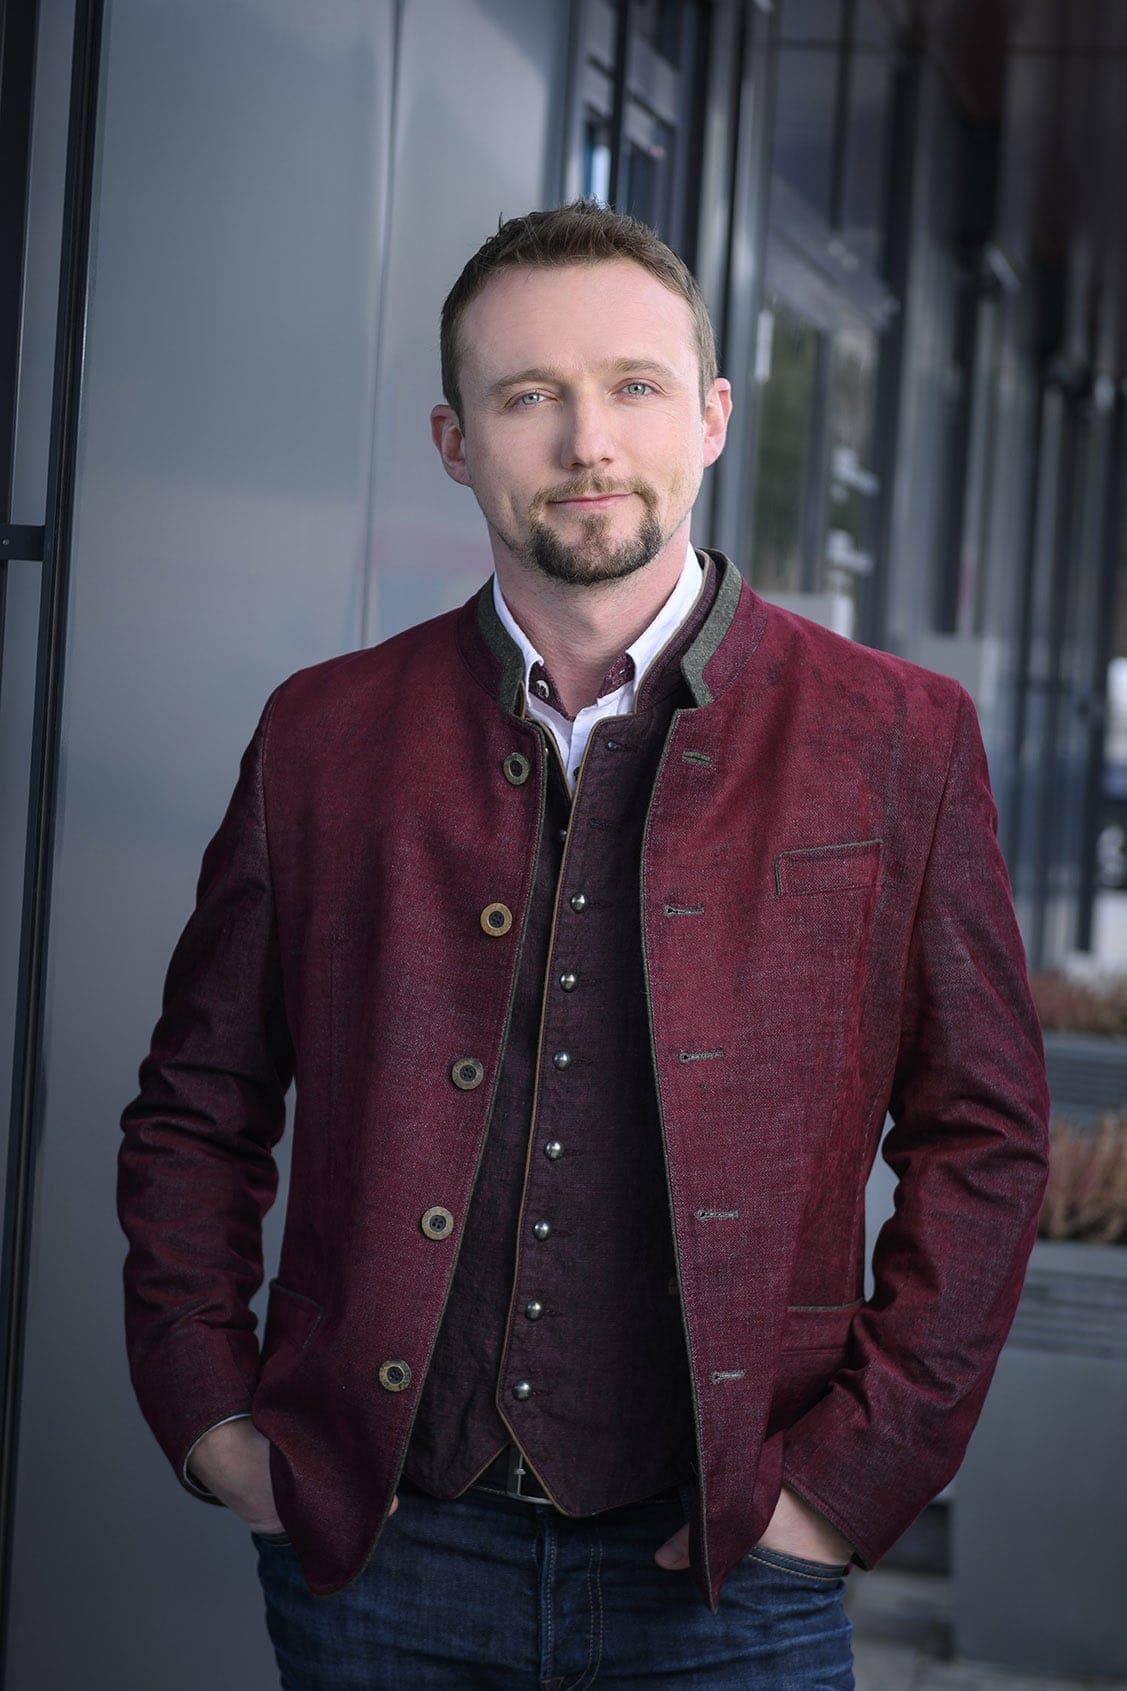 Markus Juffinger